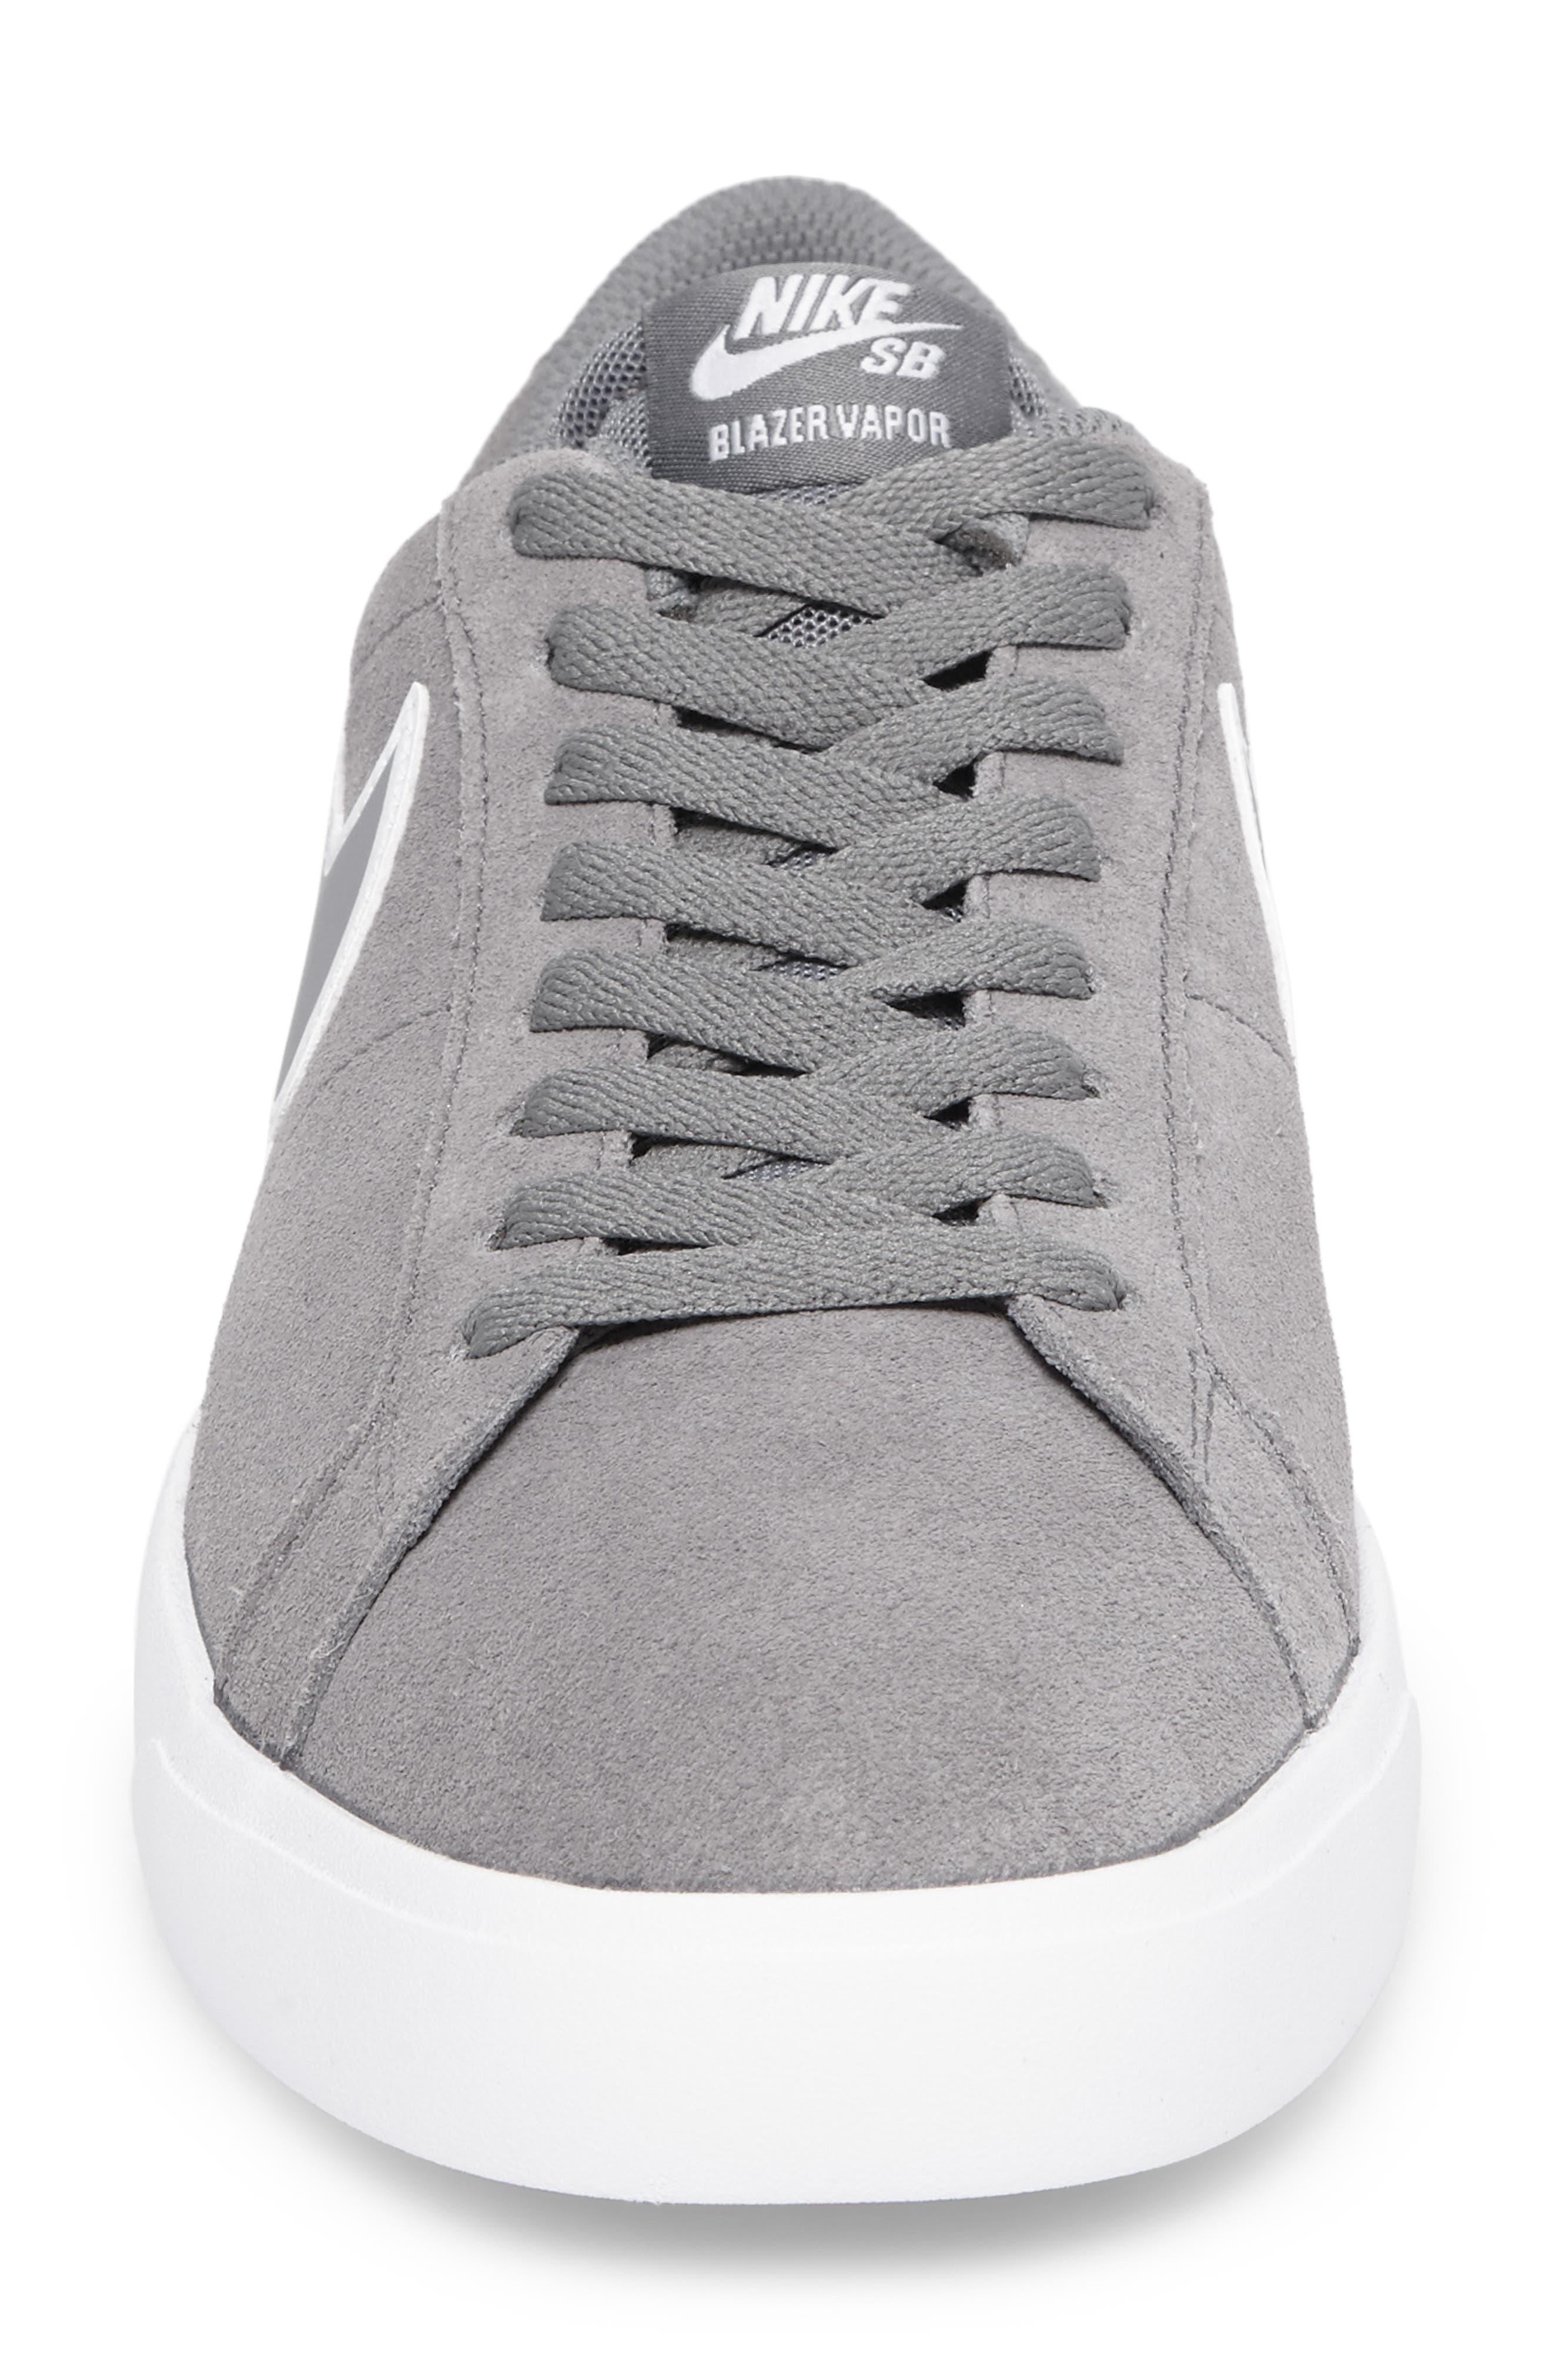 SB Blazer Vapor Skateboarding Sneaker,                             Alternate thumbnail 4, color,                             Cool Grey/Cool Grey/White